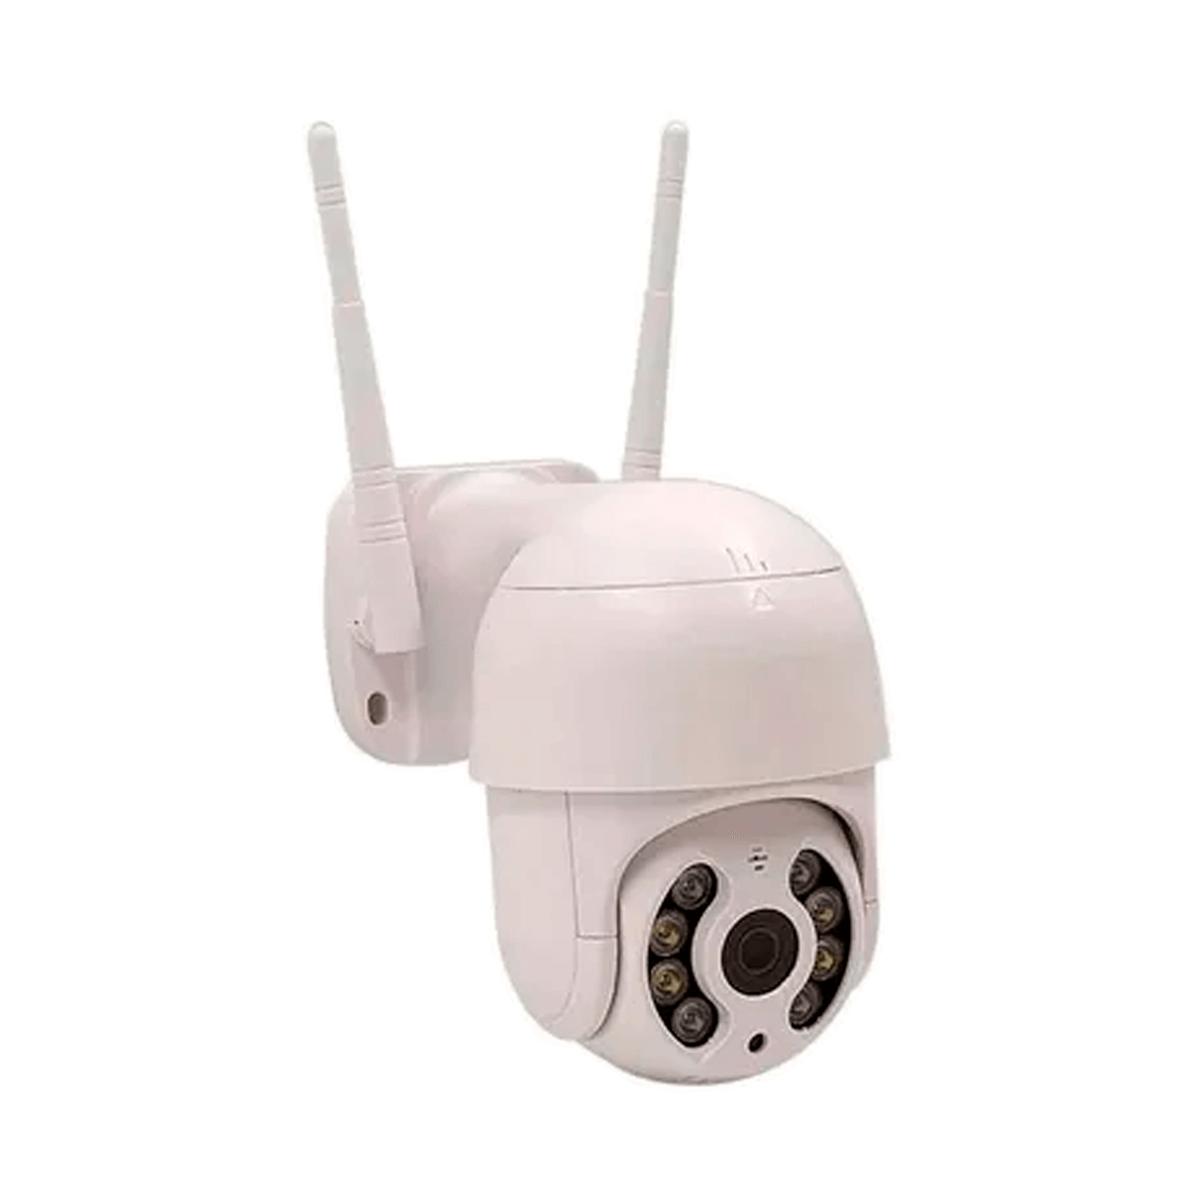 Câmera Wi-Fi IP Speed Dome HB TECH IP66 2 Megapixel